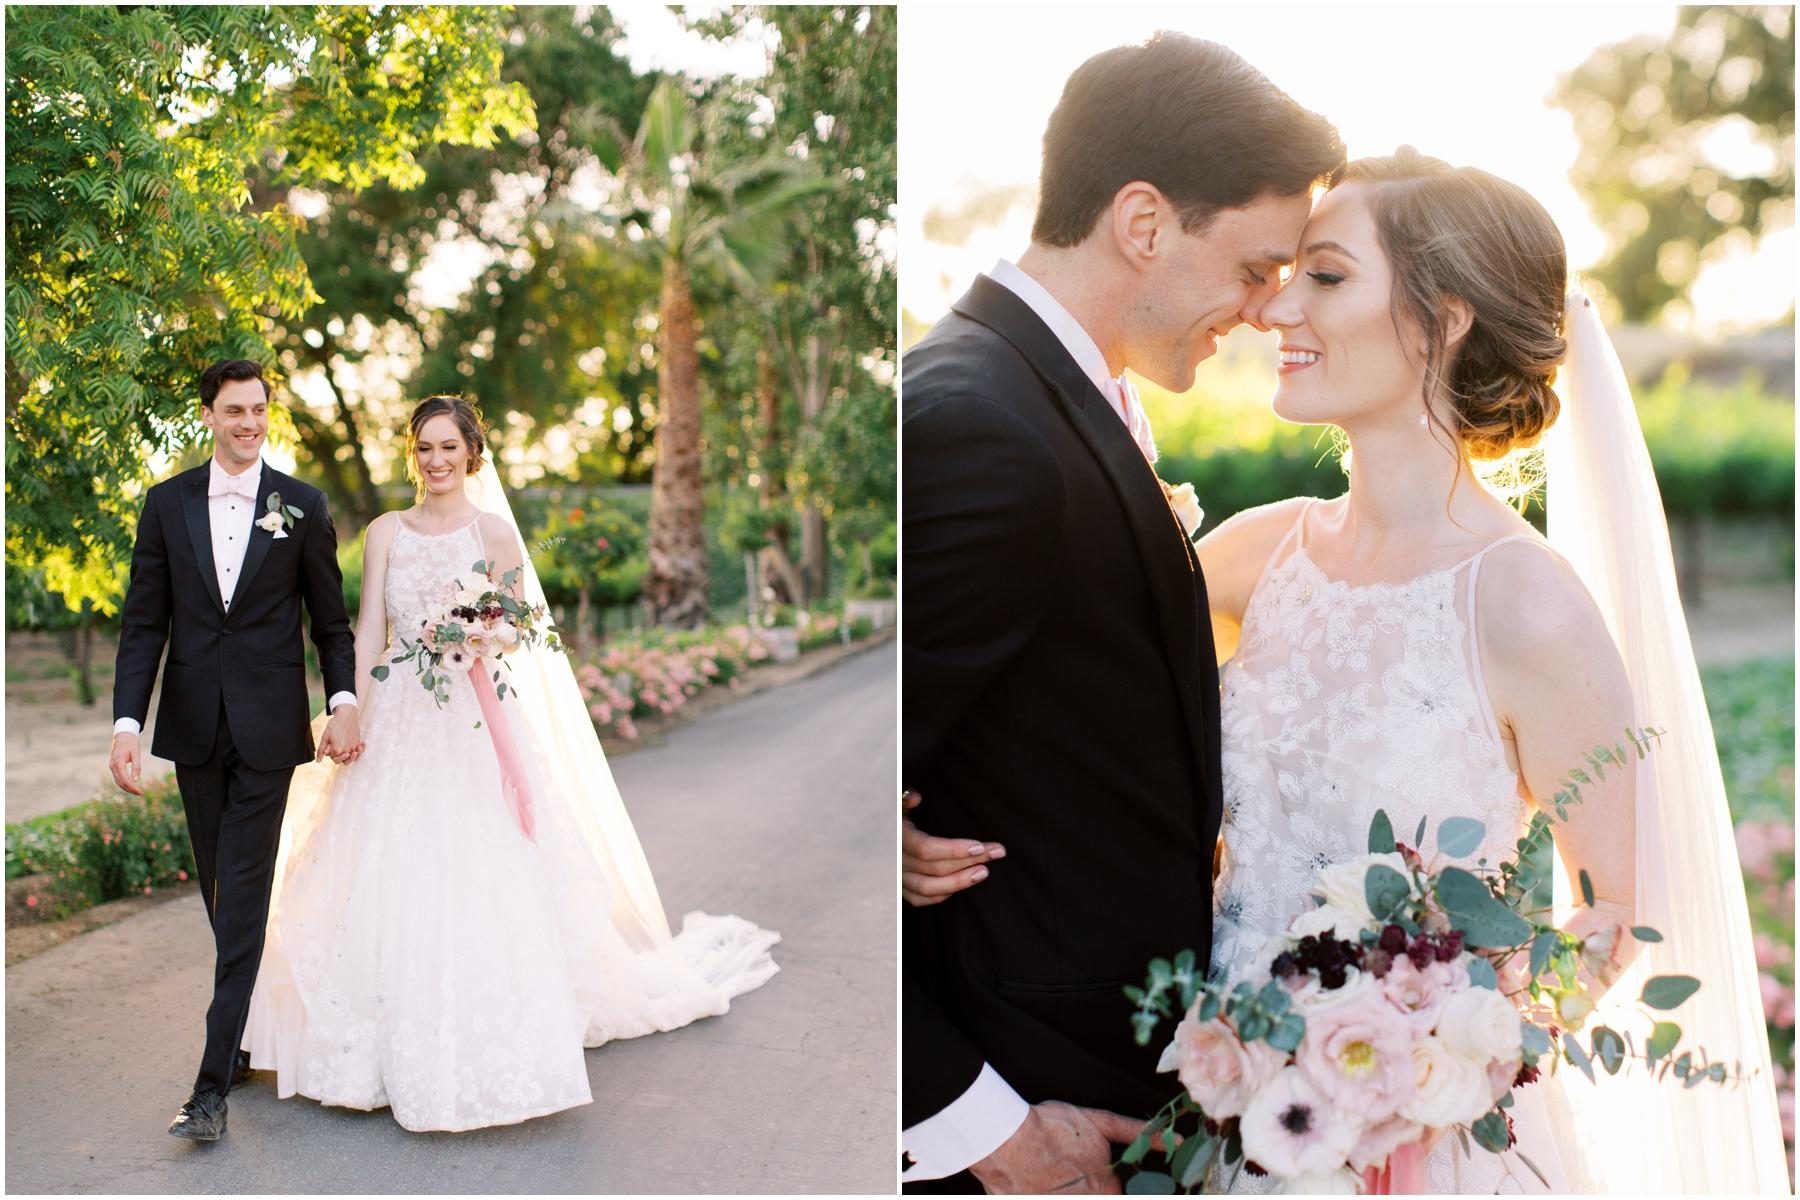 Scribner-bend-vineyards-wedding-sacramento-california-Kristine-Herman-Photography-172.jpg